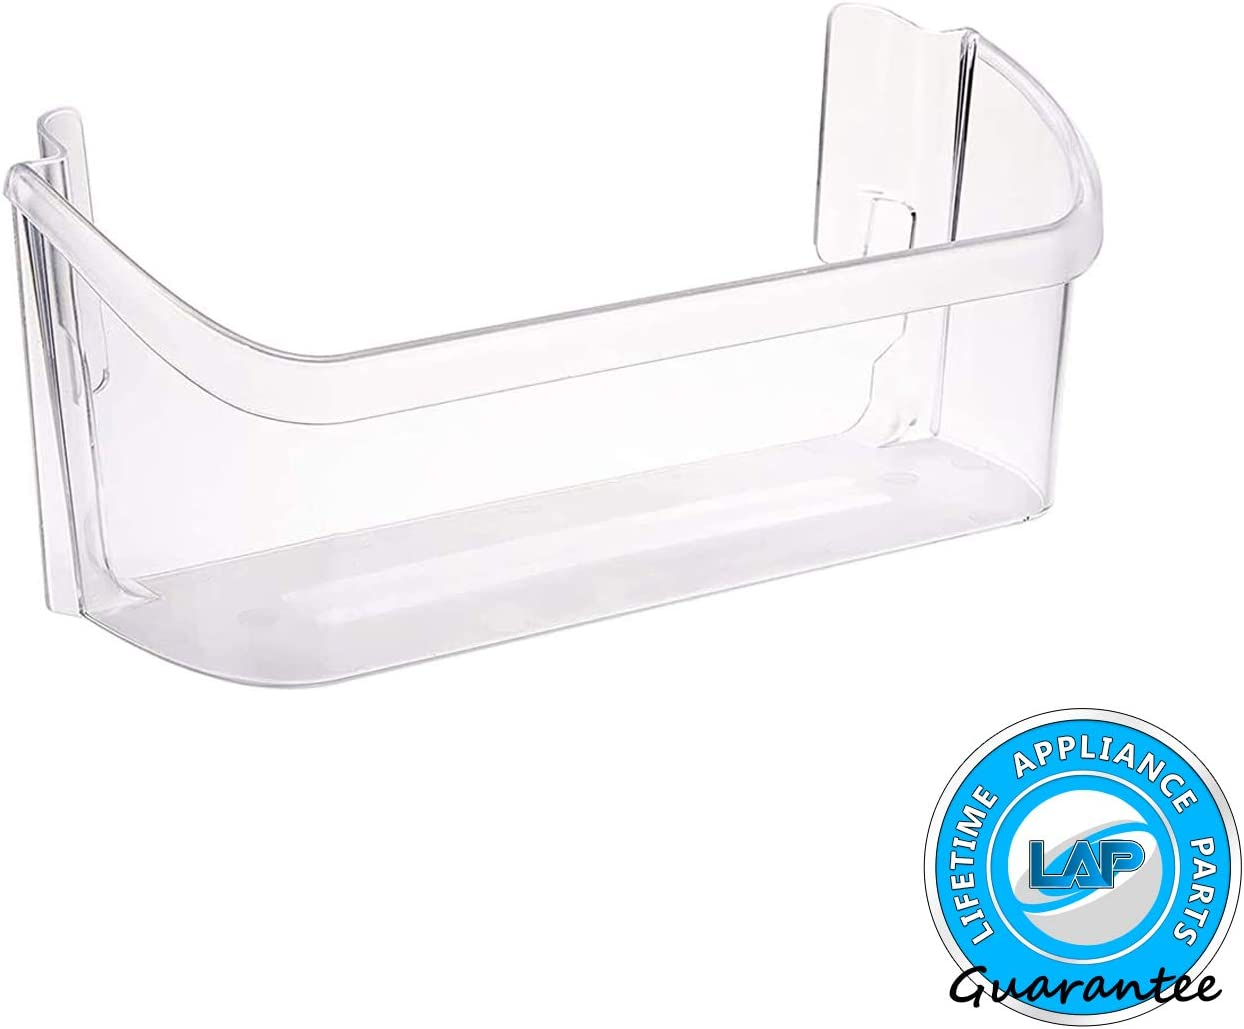 Lifetime Appliance 240363702 Door Shelf Rack Compatible with Frigidaire Refrigerator (1)